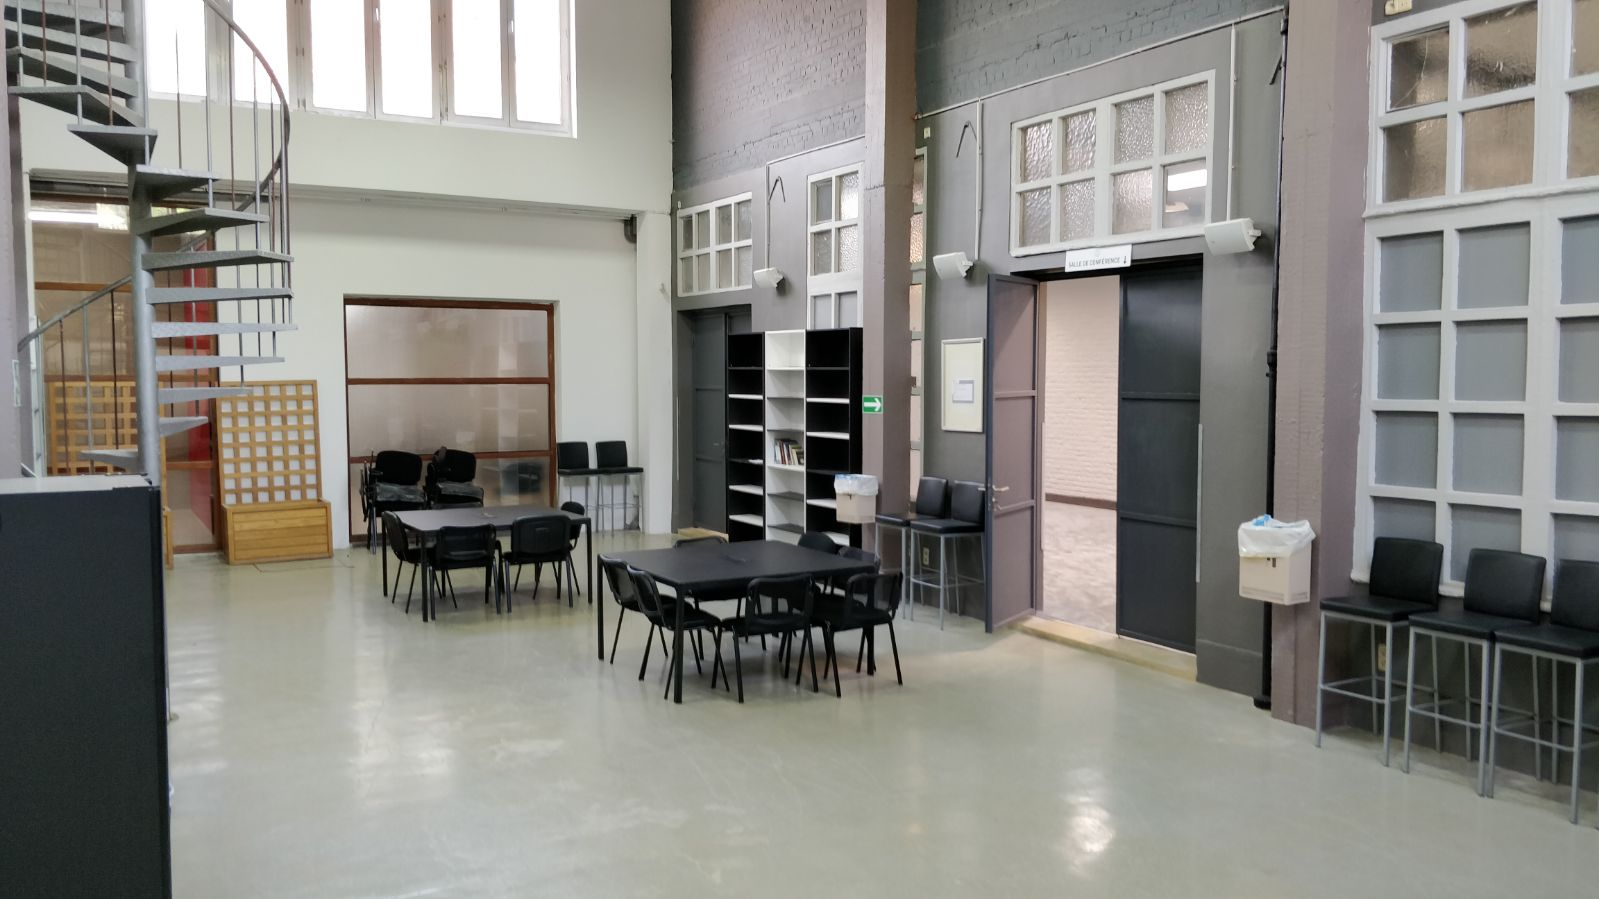 Aire de repos / Bibliothèque - Markaz Al-Forqane